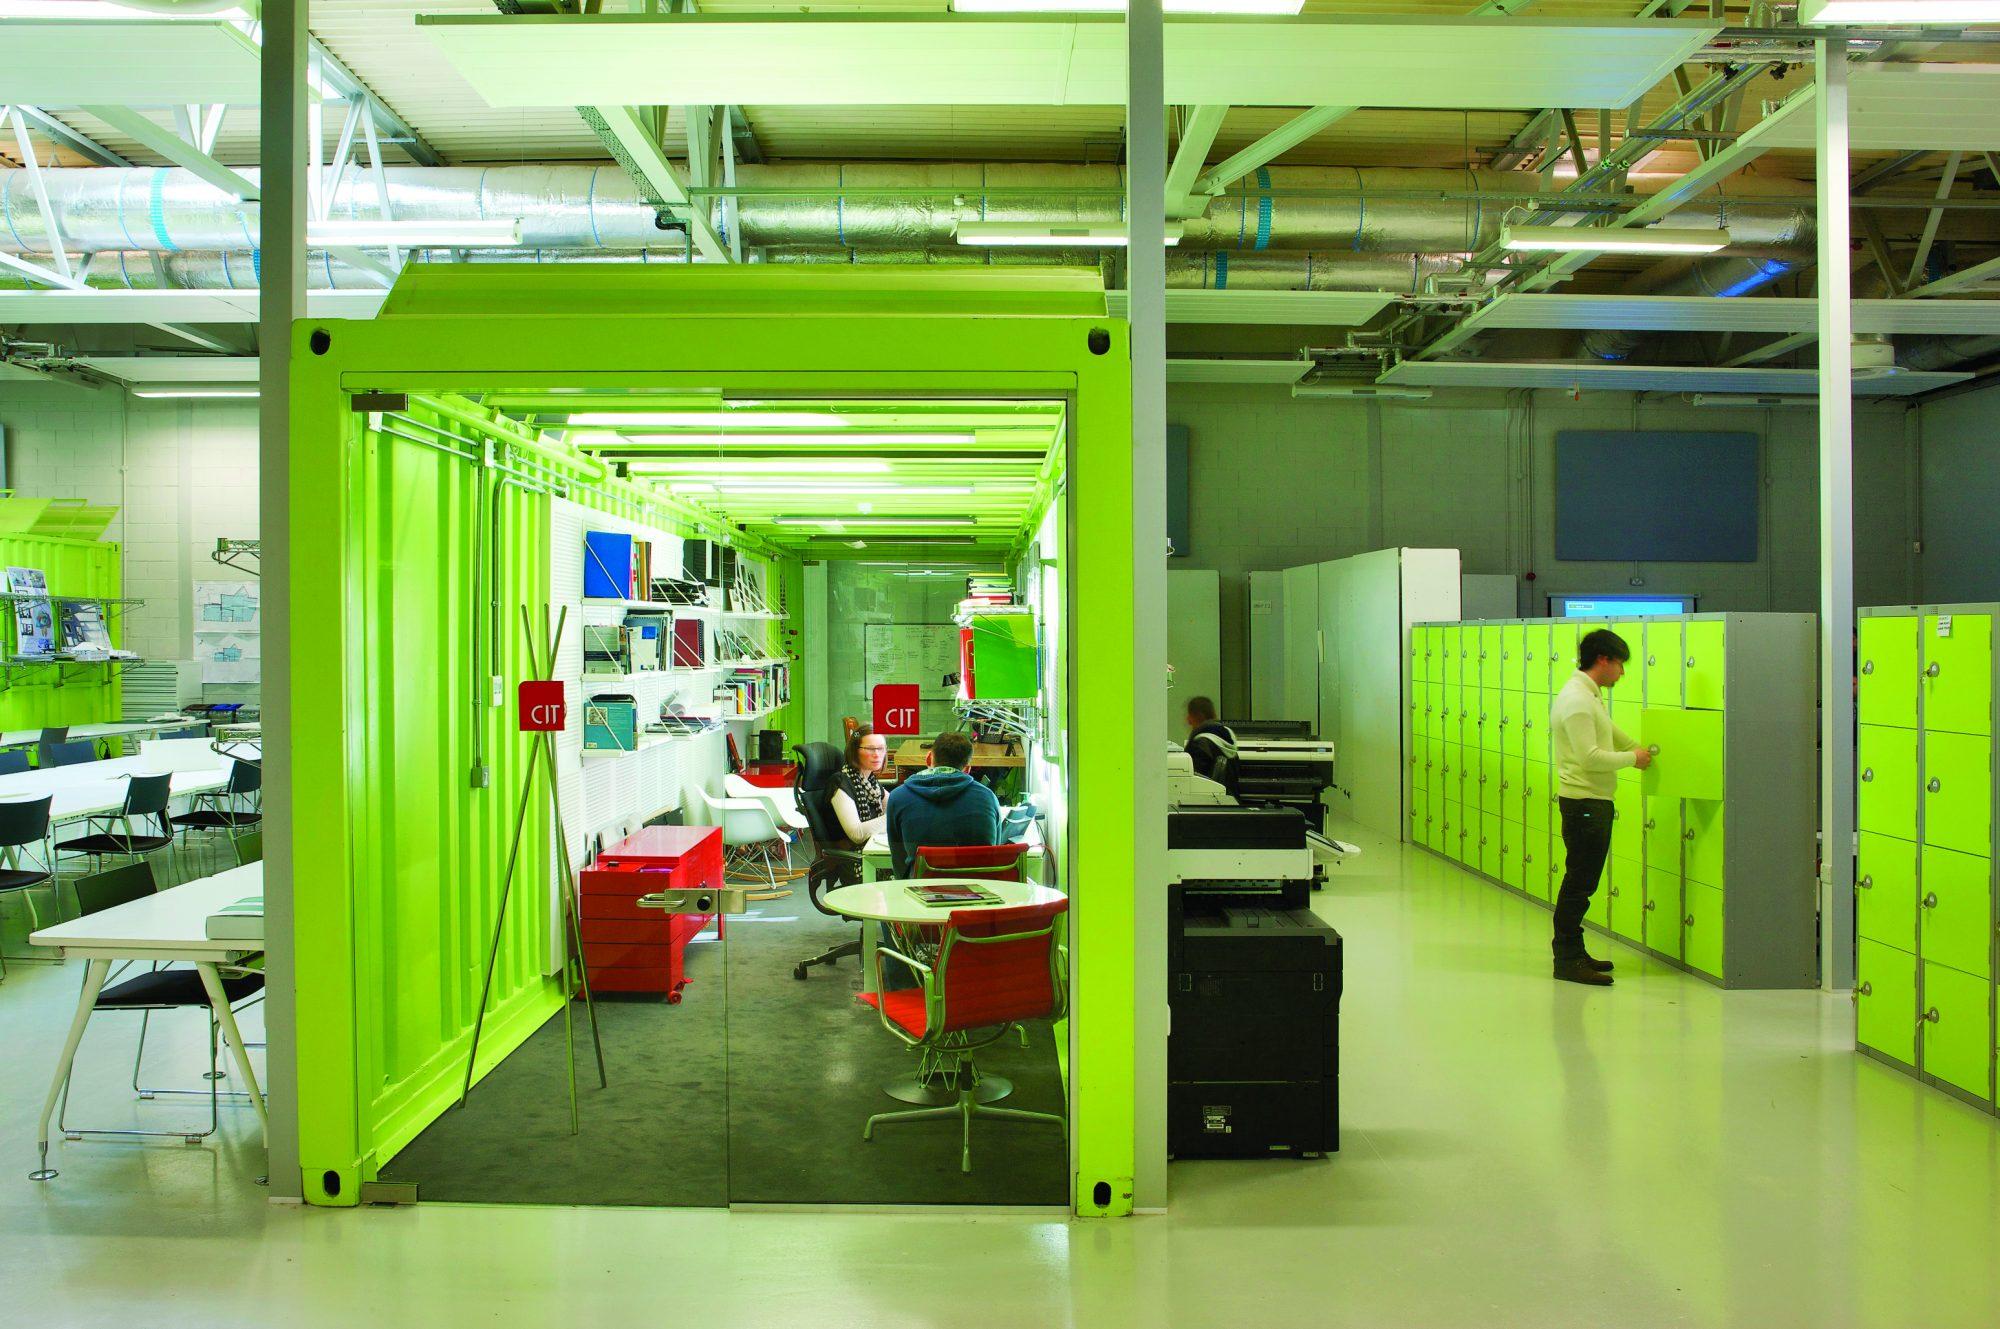 Specialisms in interior design, Interior Design Specialisms